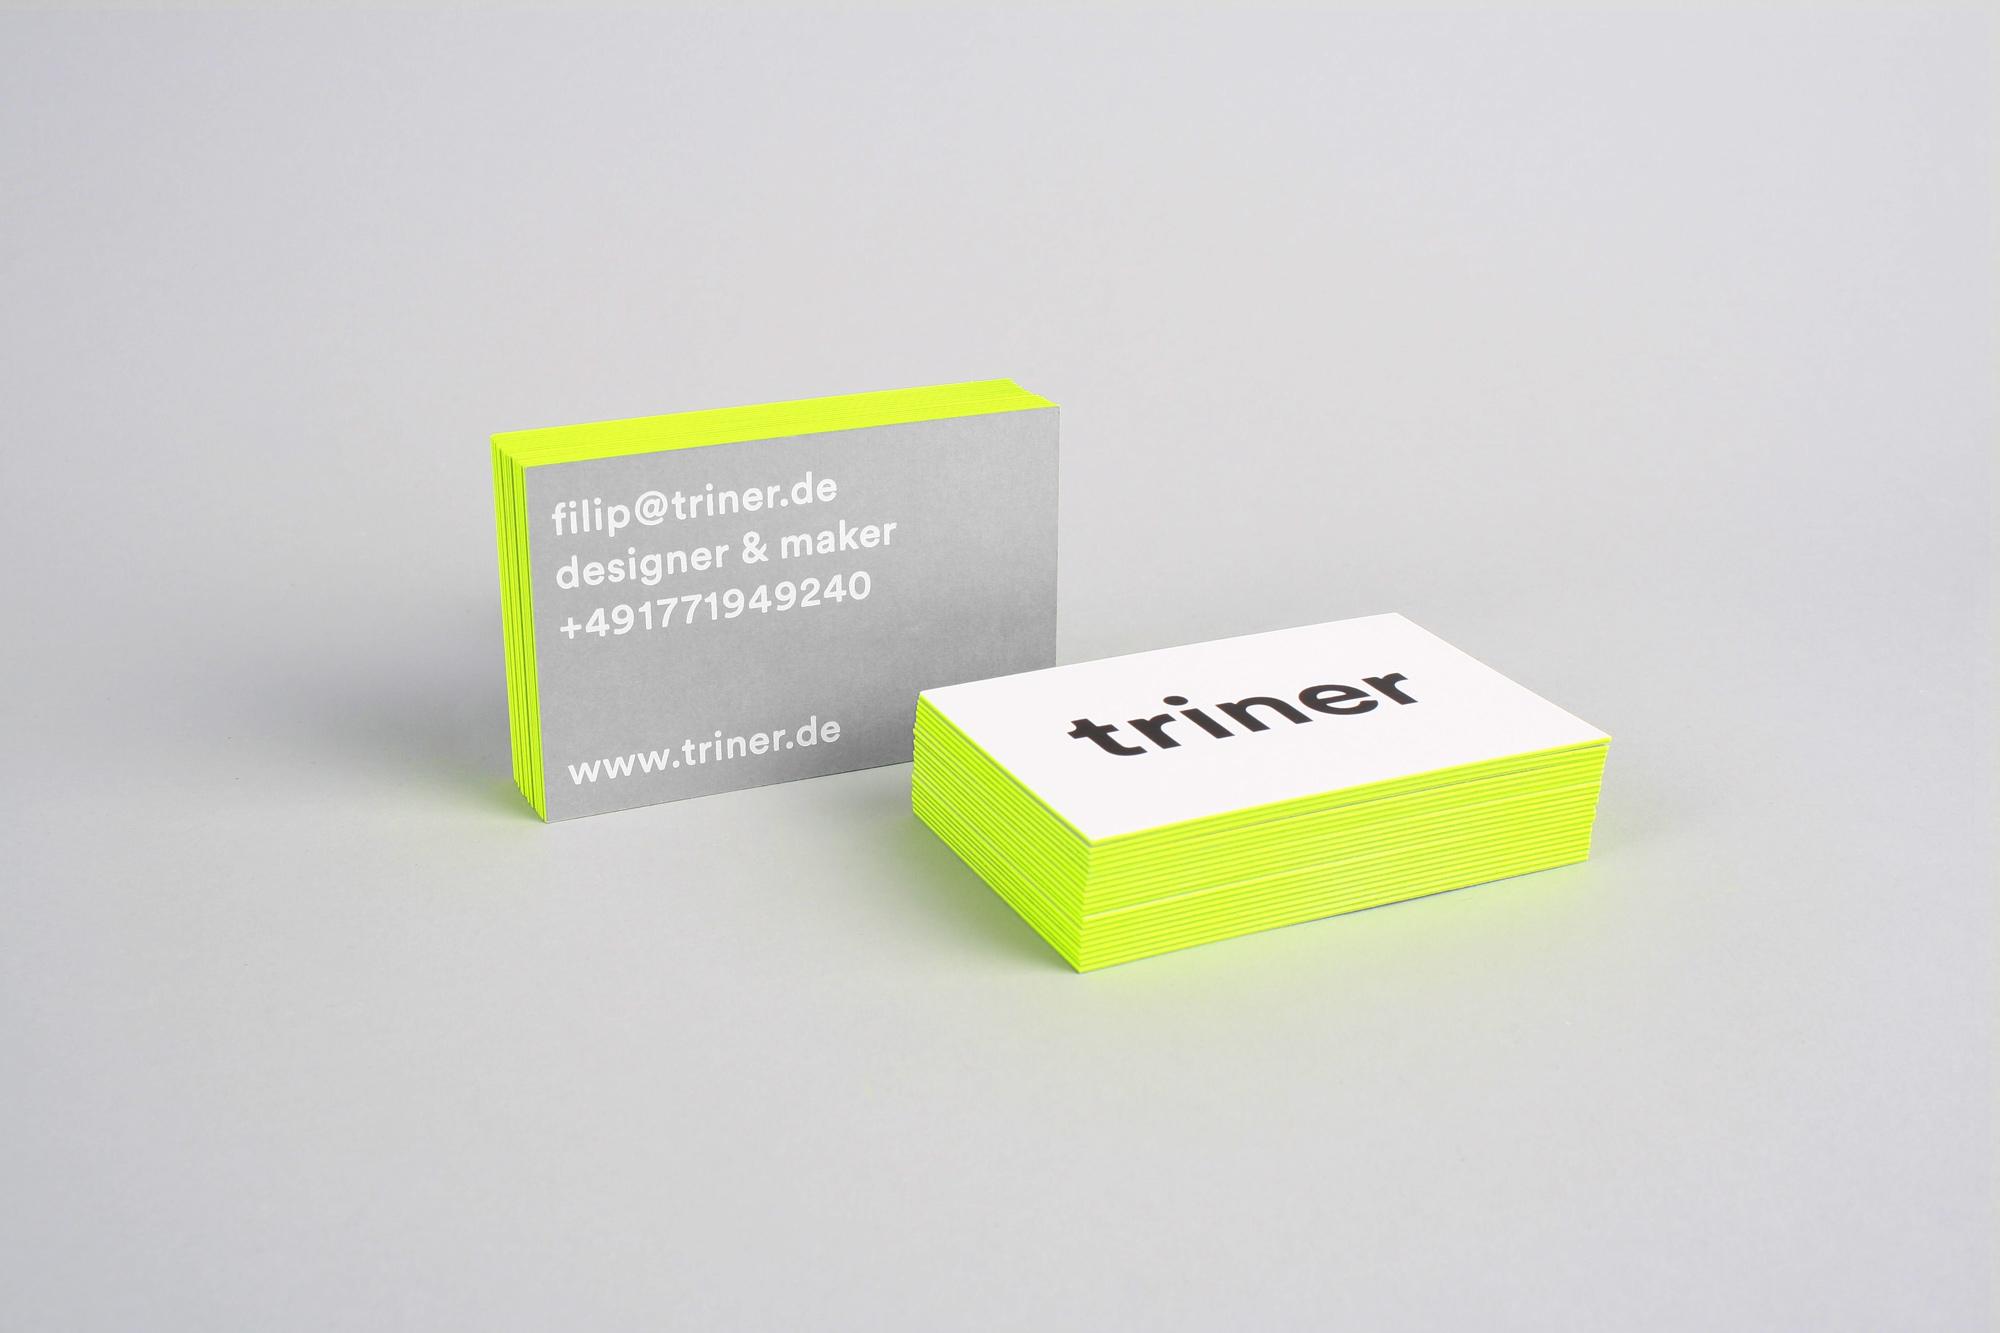 Filip TrinerTriner business cards - Filip Triner